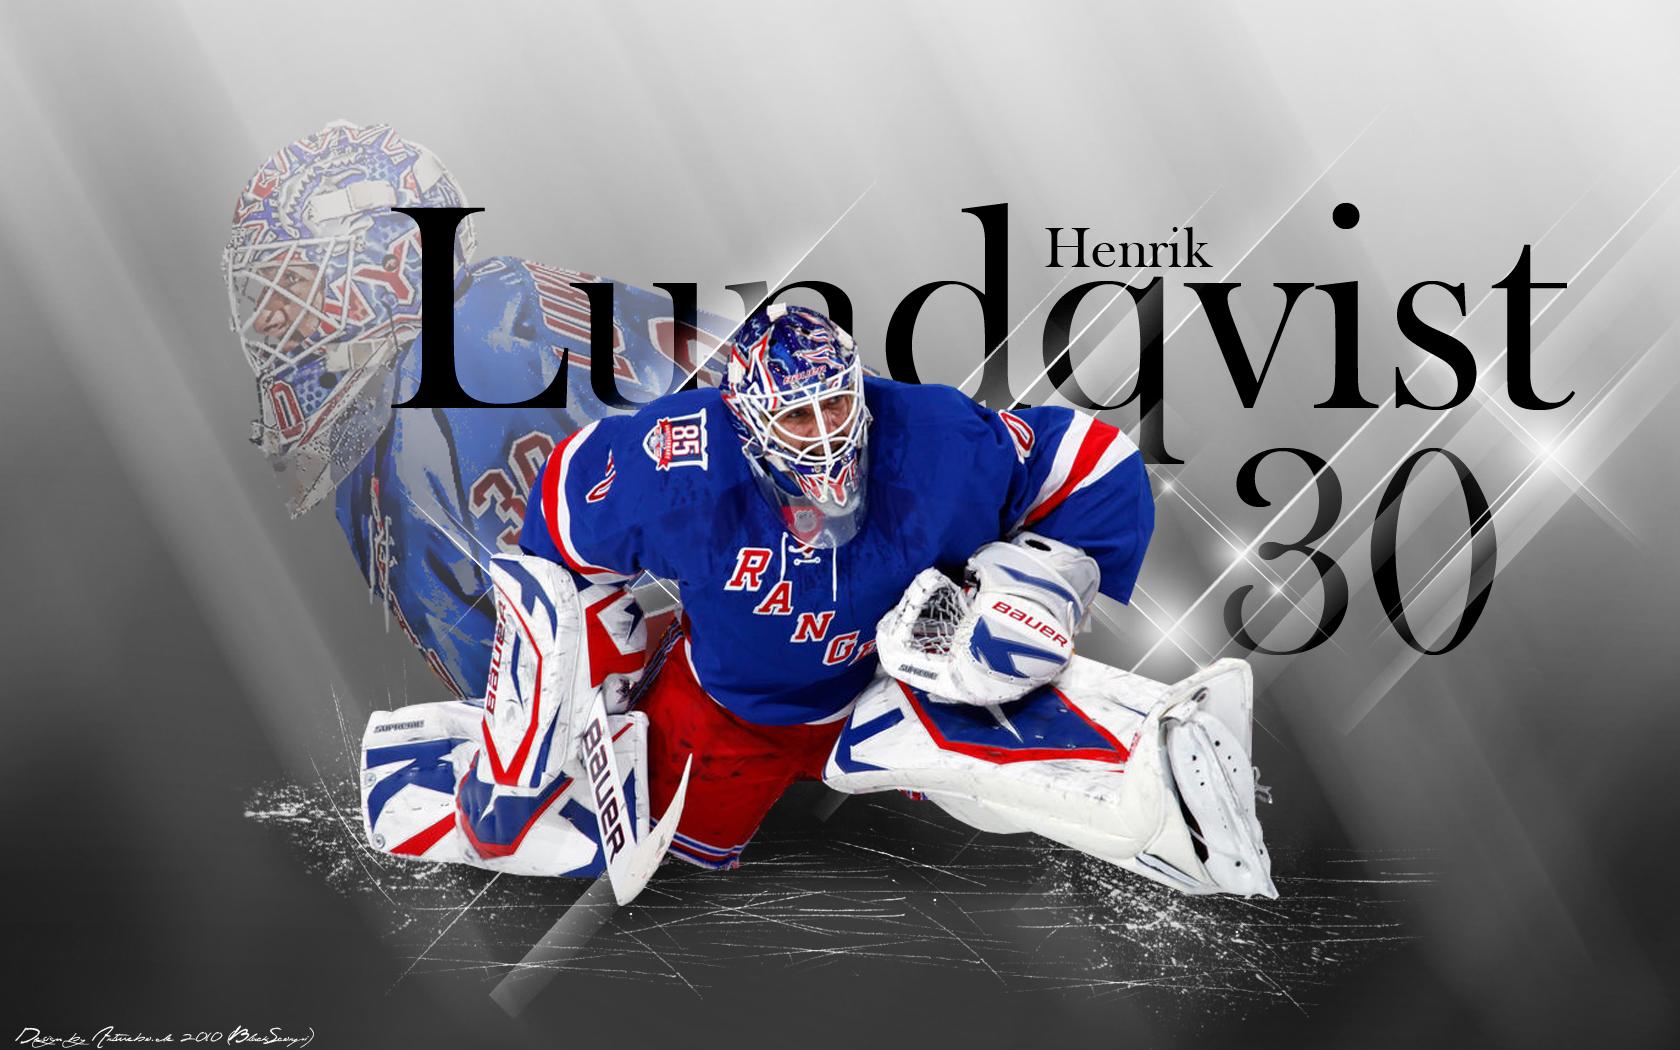 Nhl New York Rangers Hockey Player Henrik Ludqvist 1680x1050 Download Hd Wallpaper Wallpapertip